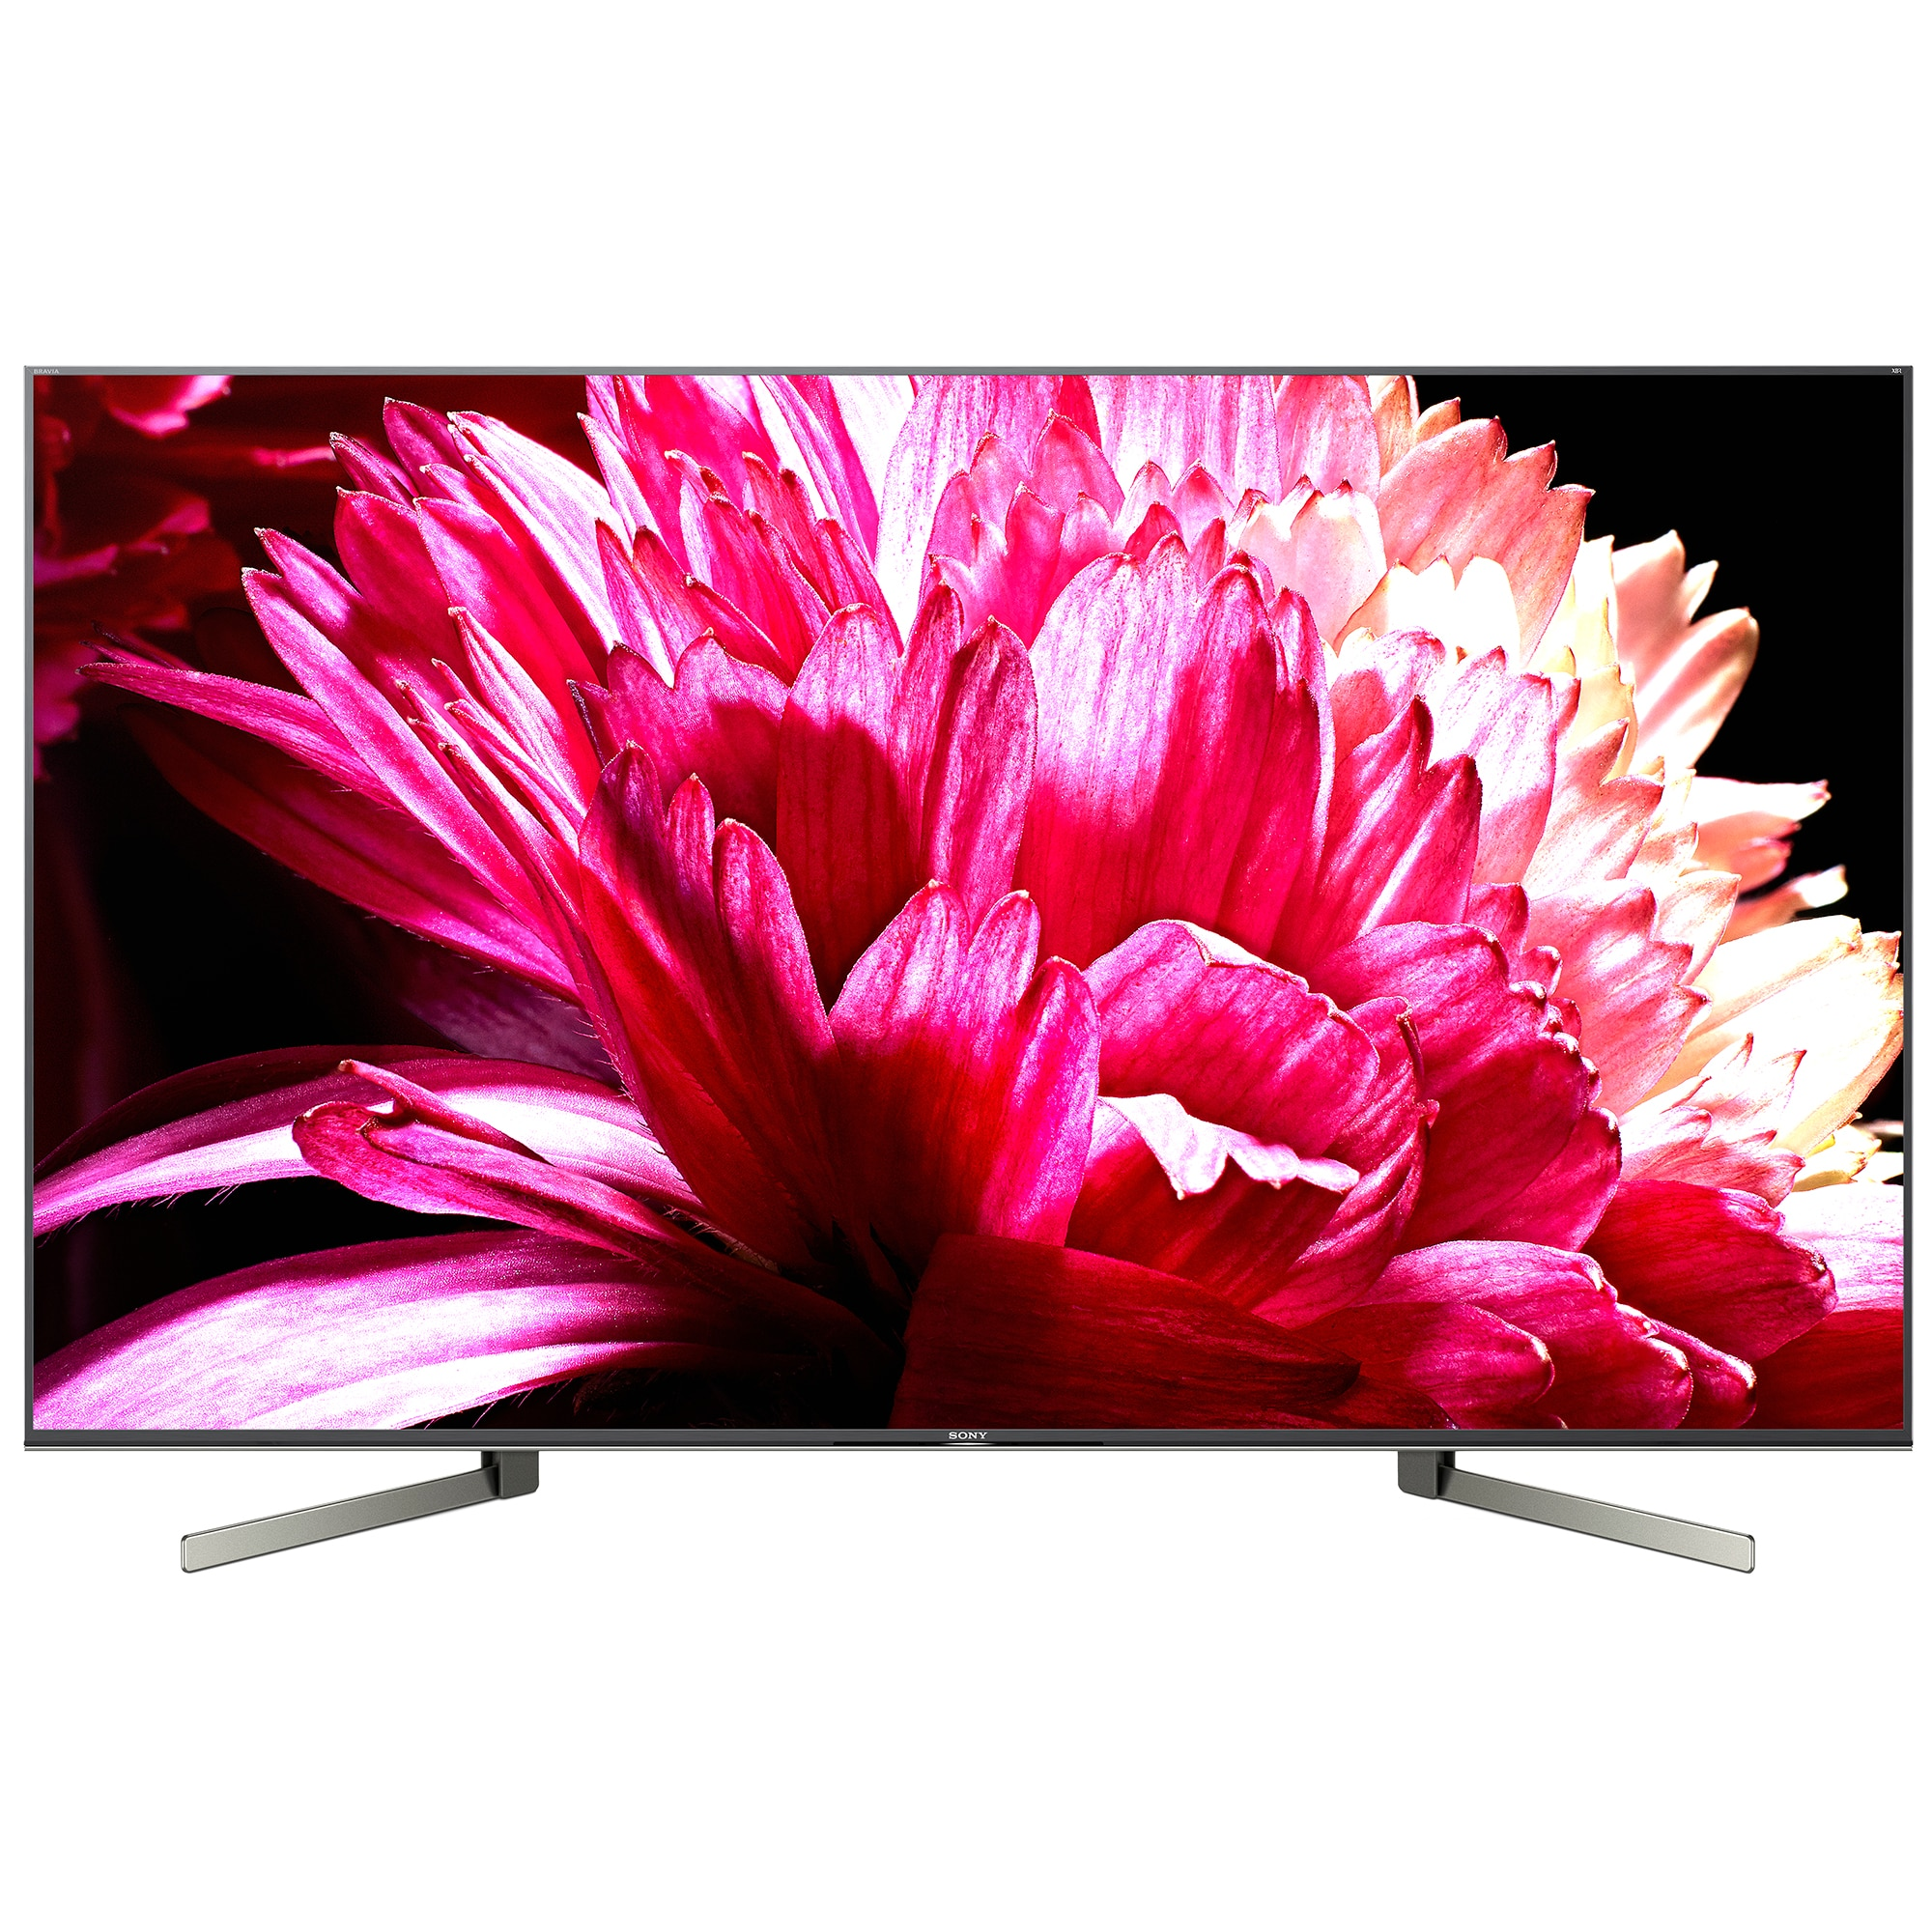 Fotografie Televizor Smart Android LED Sony BRAVIA, 138.8 cm, 55XG9505, 4K Ultra HD, Clasa B